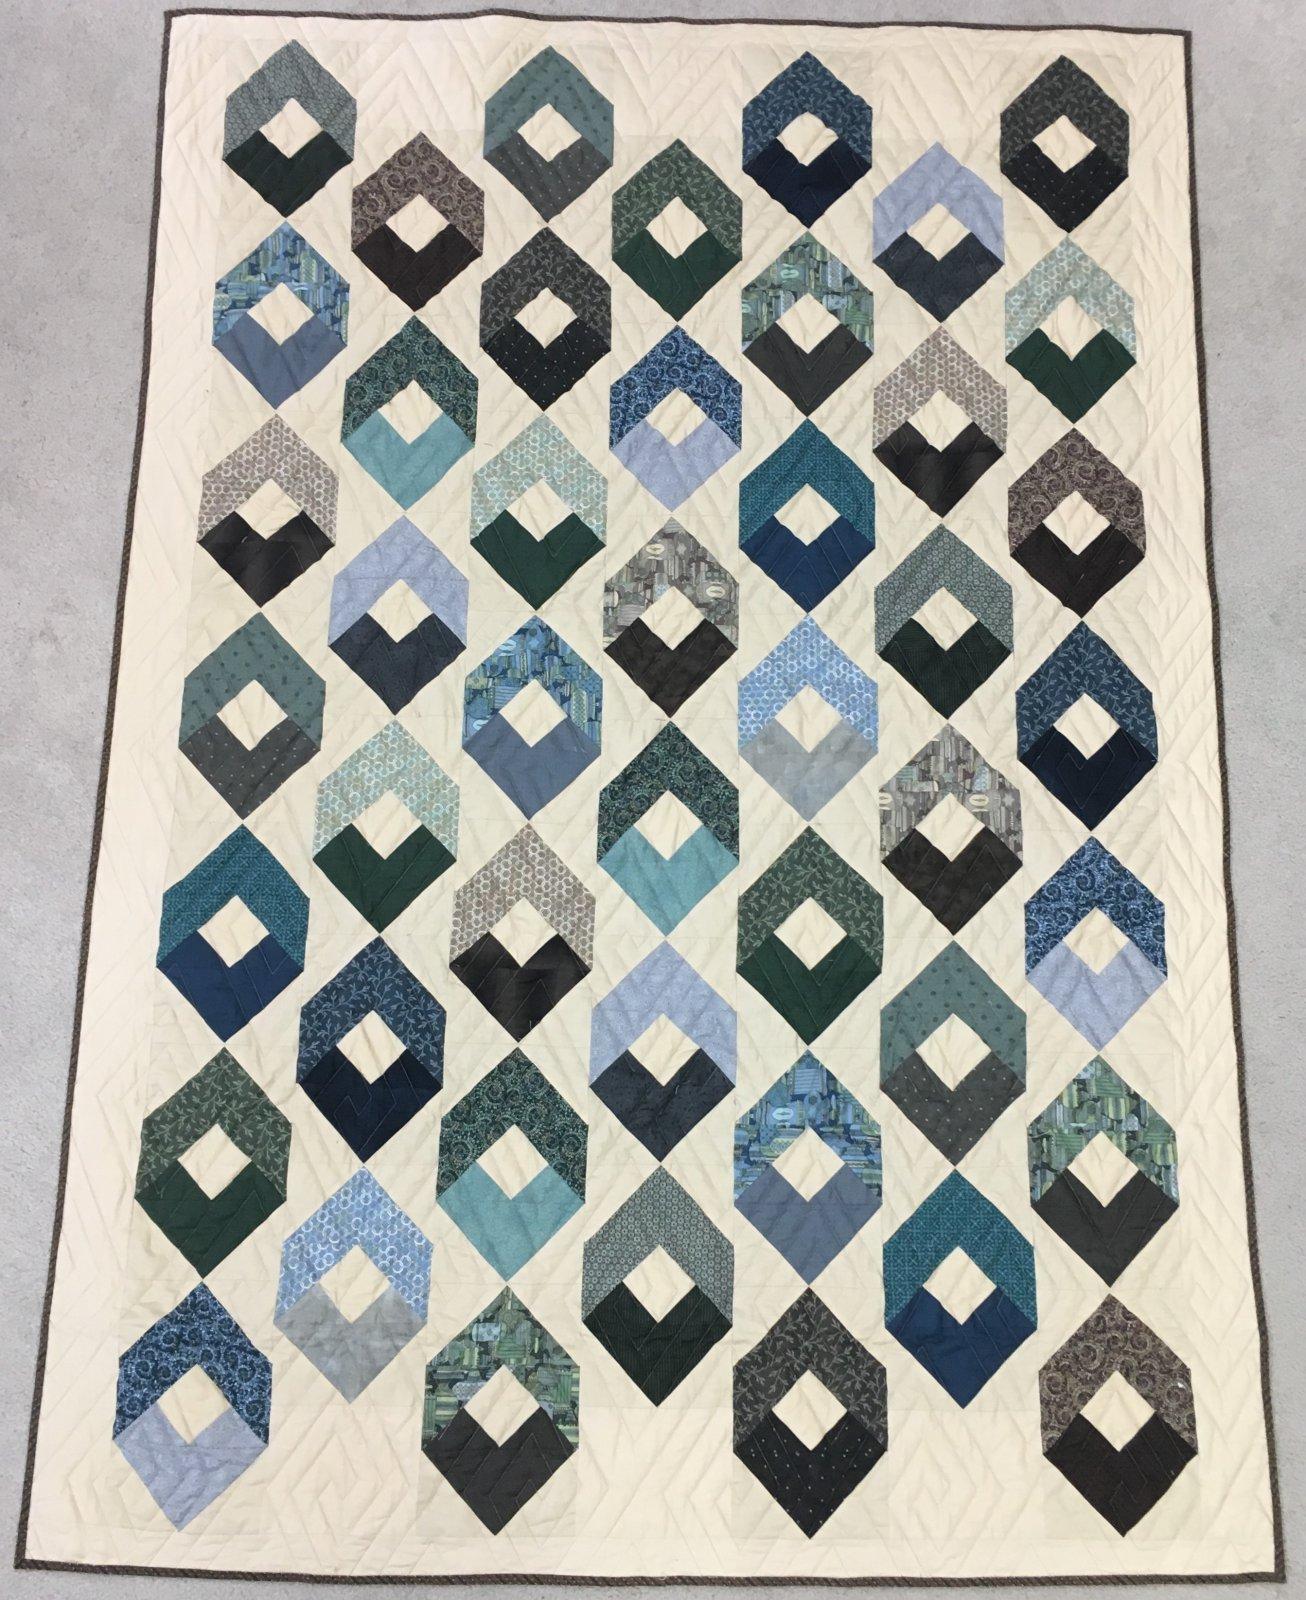 Georgetown Quilt Kit 64.5 x 88.5 Twin